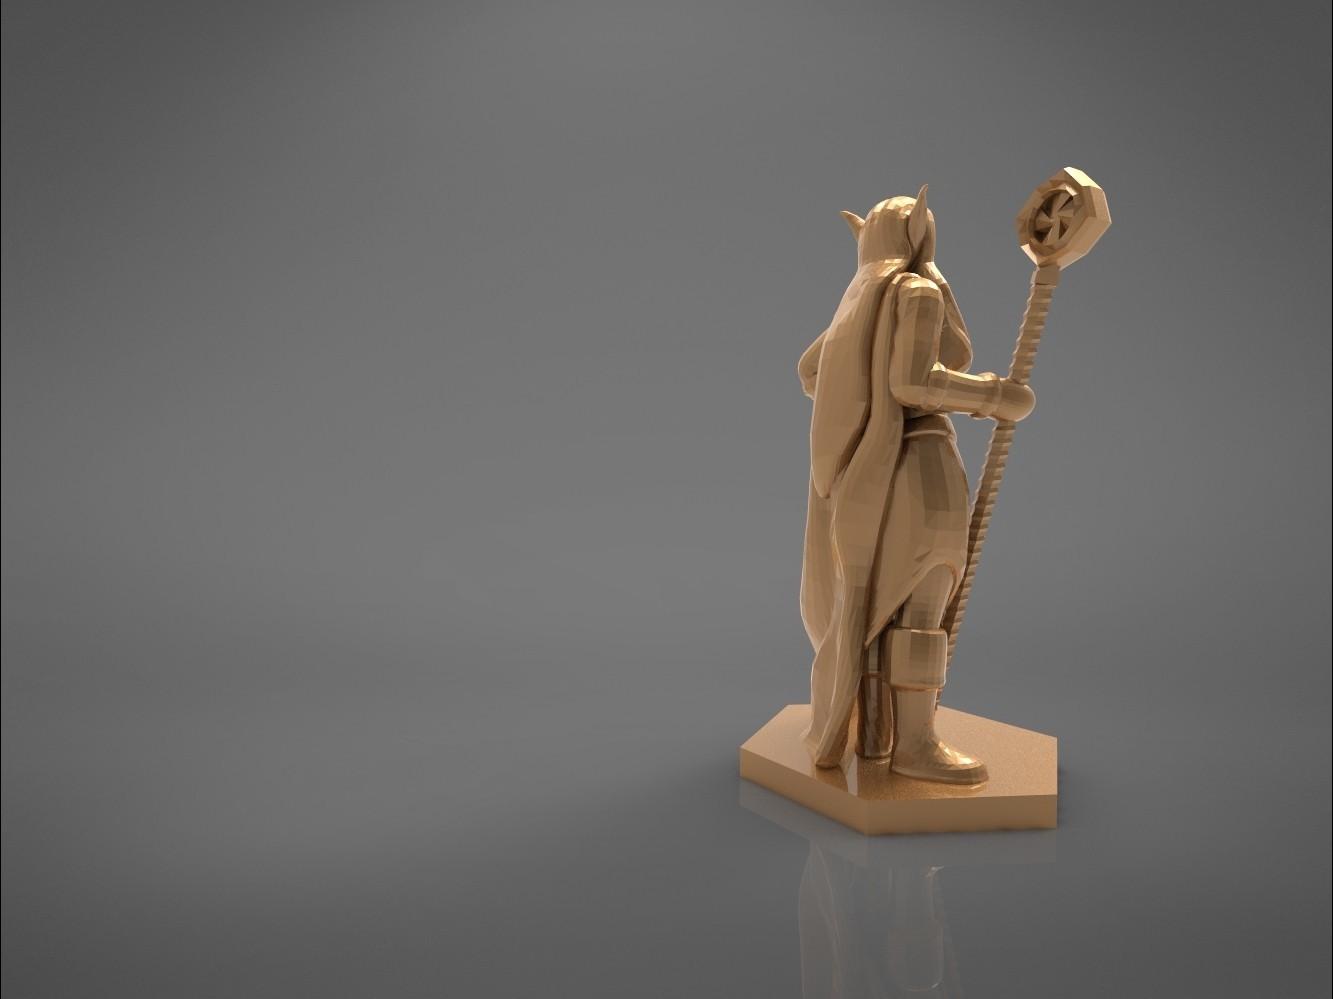 Mage_2_-main_render_2.167.jpg Download STL file ELF MAGE FEMALE CHARACTER GAME FIGURES 3D print model • 3D printing template, 3D-mon